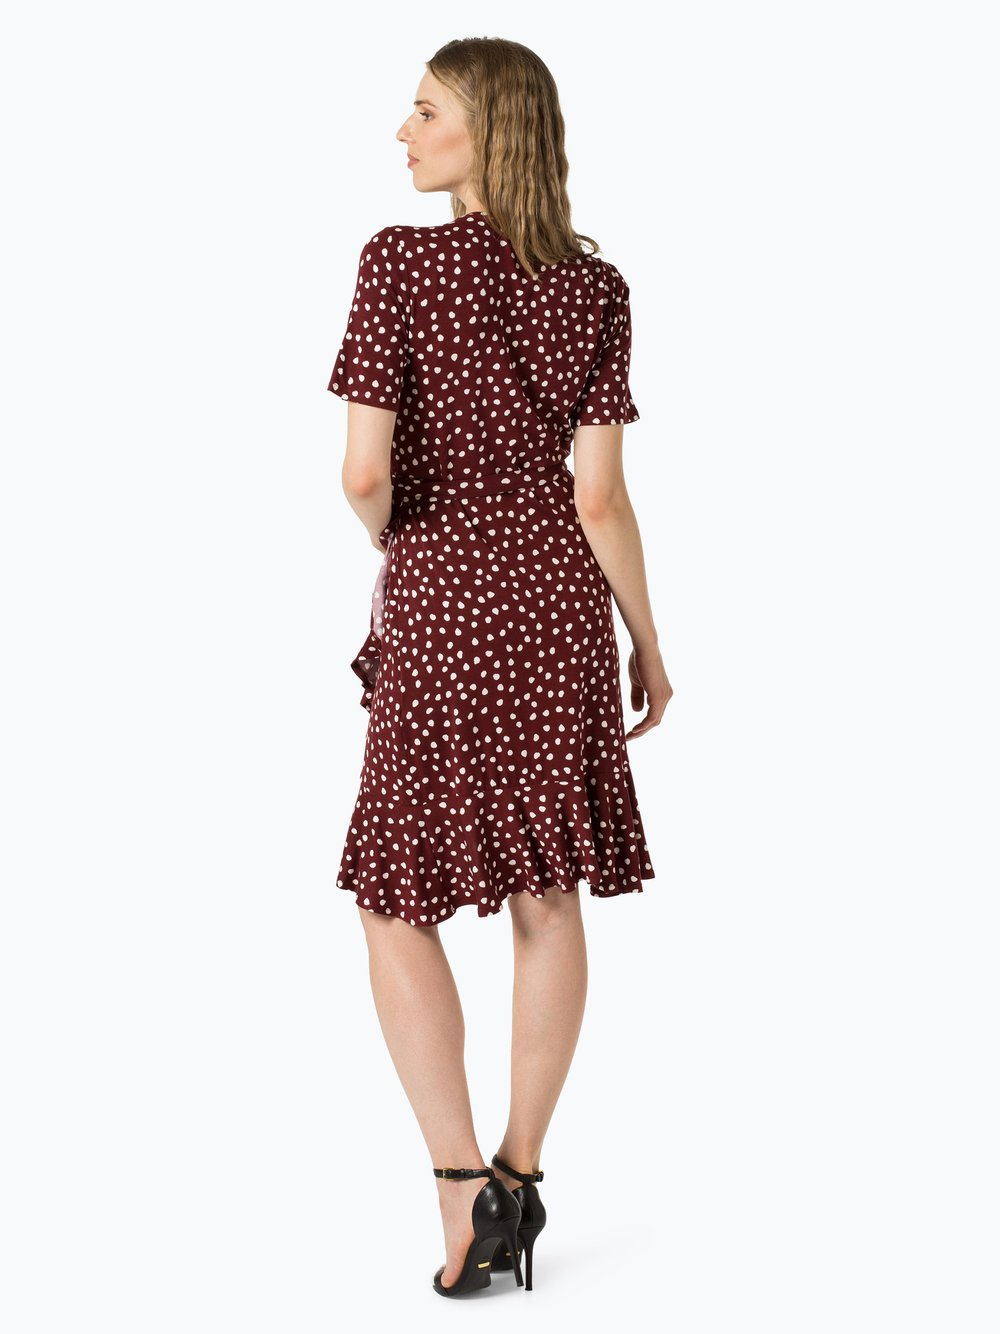 Damen Kleid - Lavanda rot Part Two eyMxYpQr